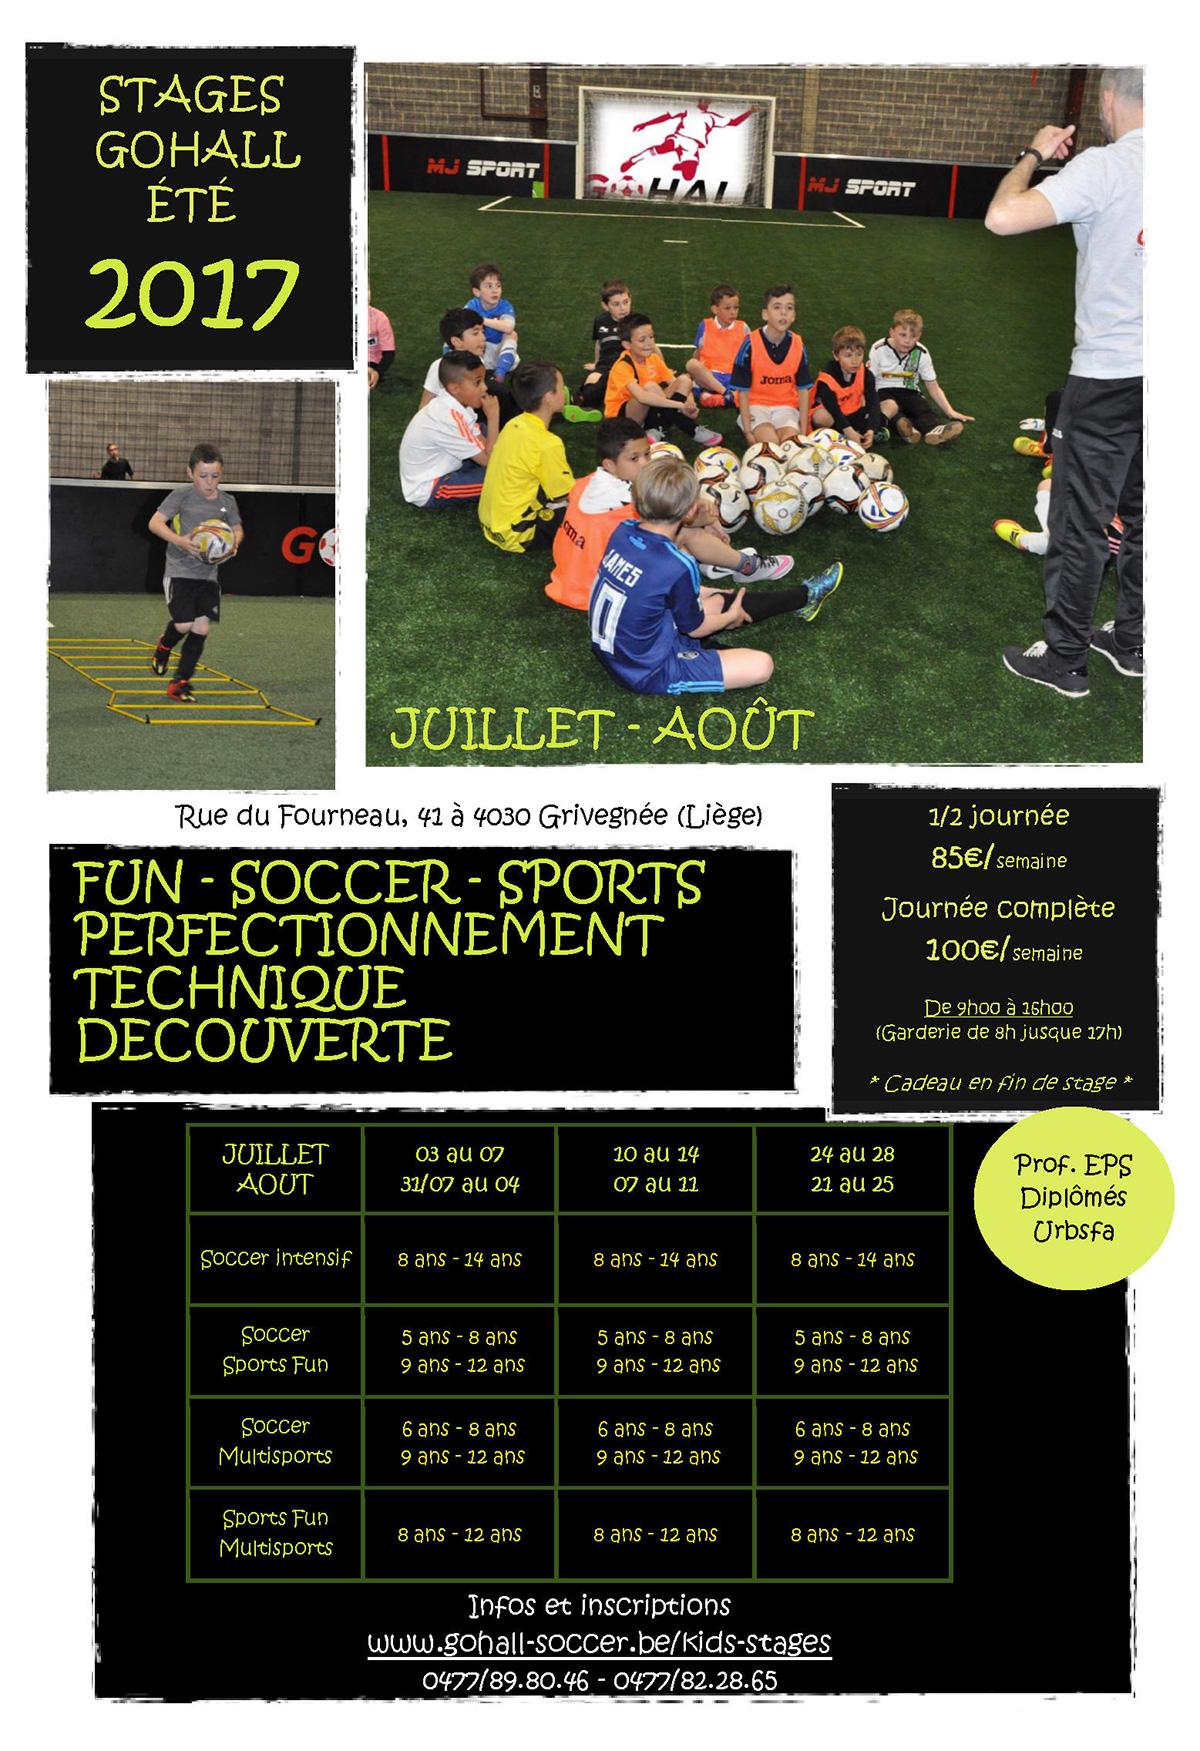 GOHALL - stage enfants Vacances été 2017